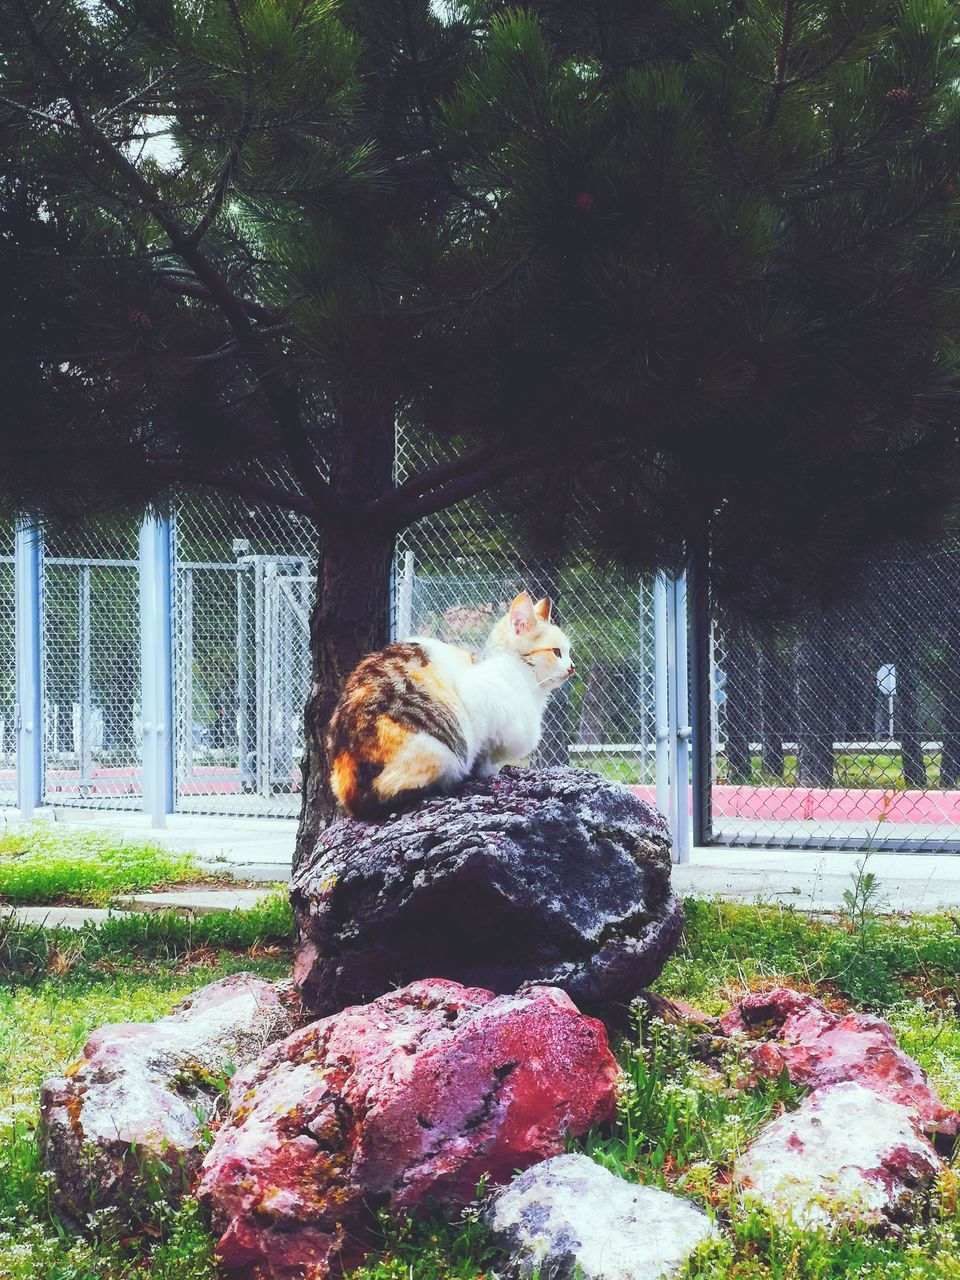 animal themes, mammal, animal, one animal, vertebrate, domestic, pets, domestic animals, plant, tree, sitting, day, no people, cat, nature, animal wildlife, domestic cat, feline, grass, built structure